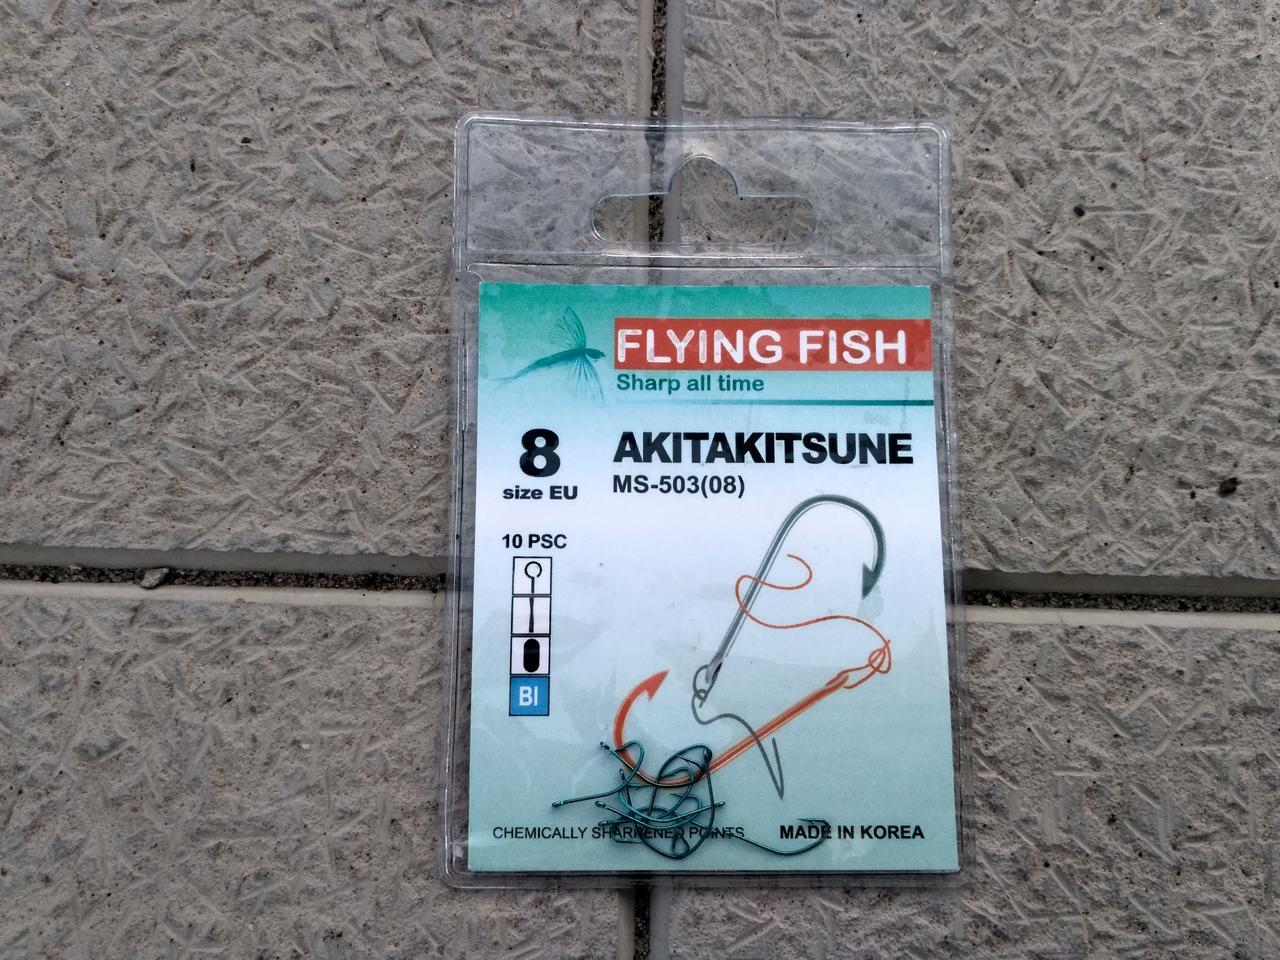 FLYING FISH AKITAKITSUNE #8